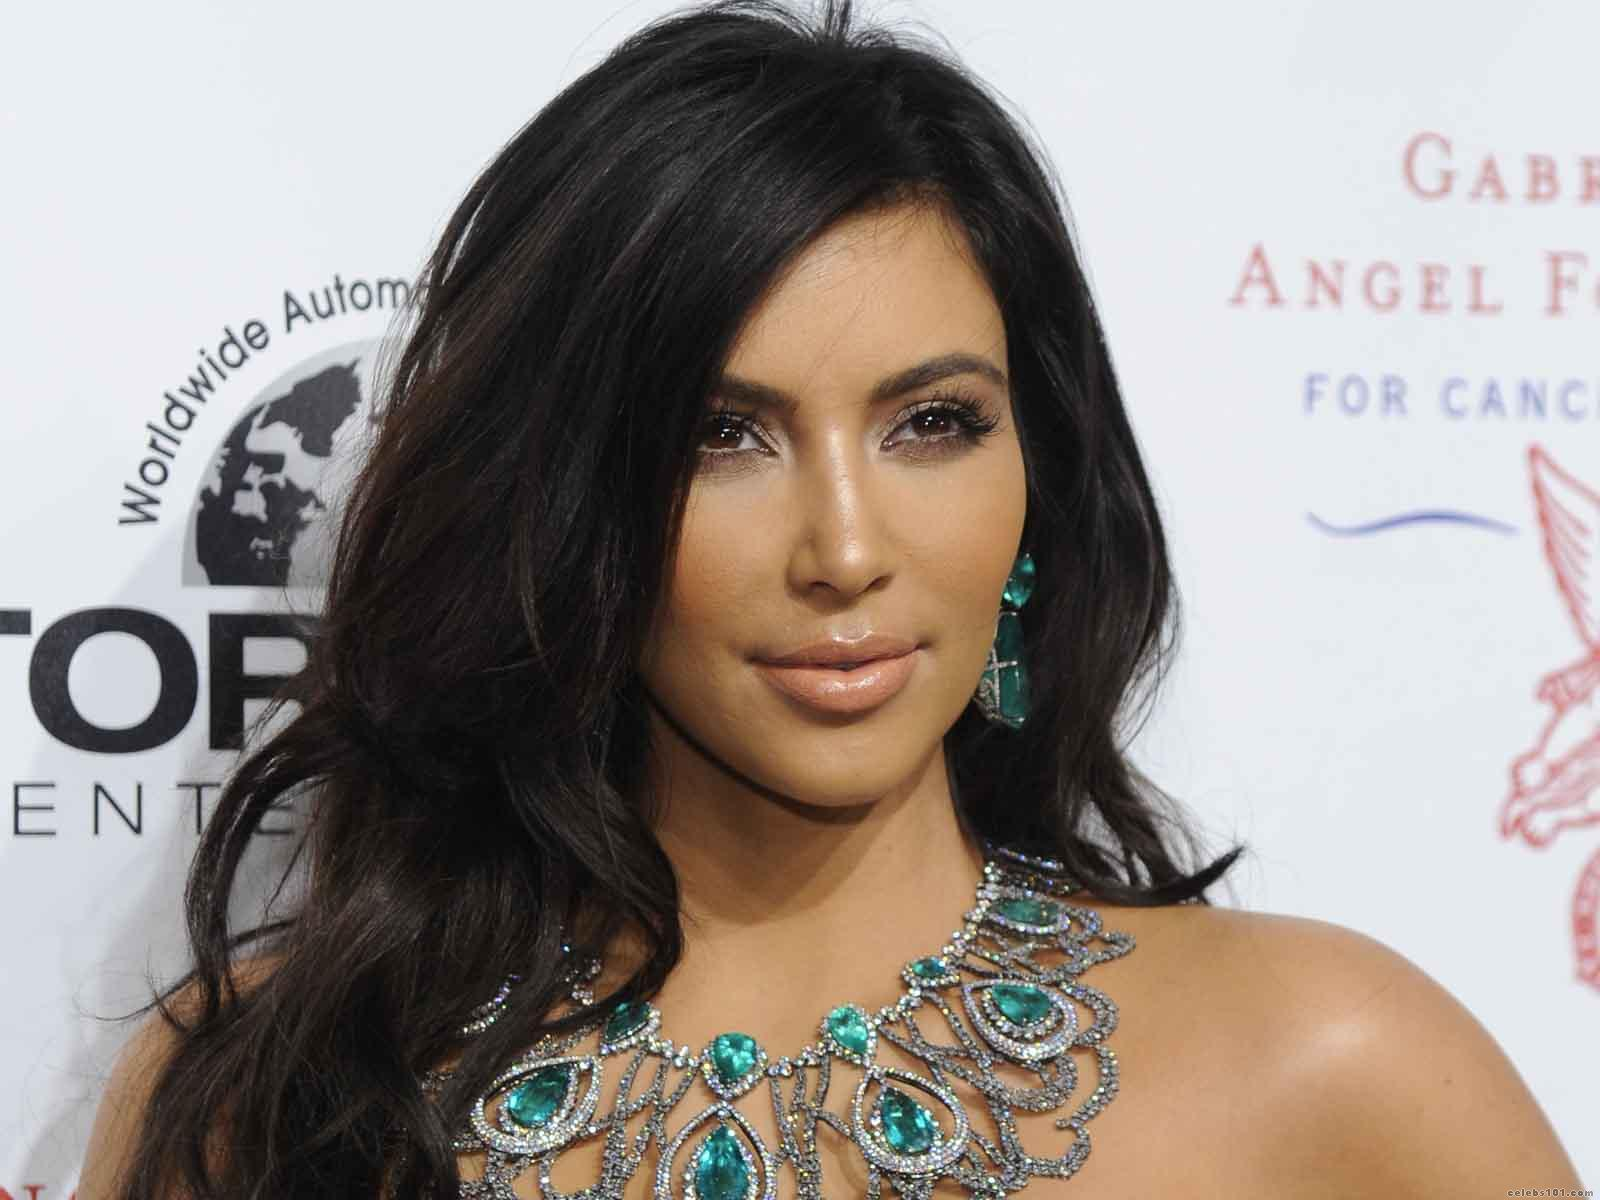 http://2.bp.blogspot.com/-t3Rp2cZOt4s/UJHI1kv709I/AAAAAAAAdkA/GWK13E8DrX0/s1600/Kim_Kardashian_quotes.jpg